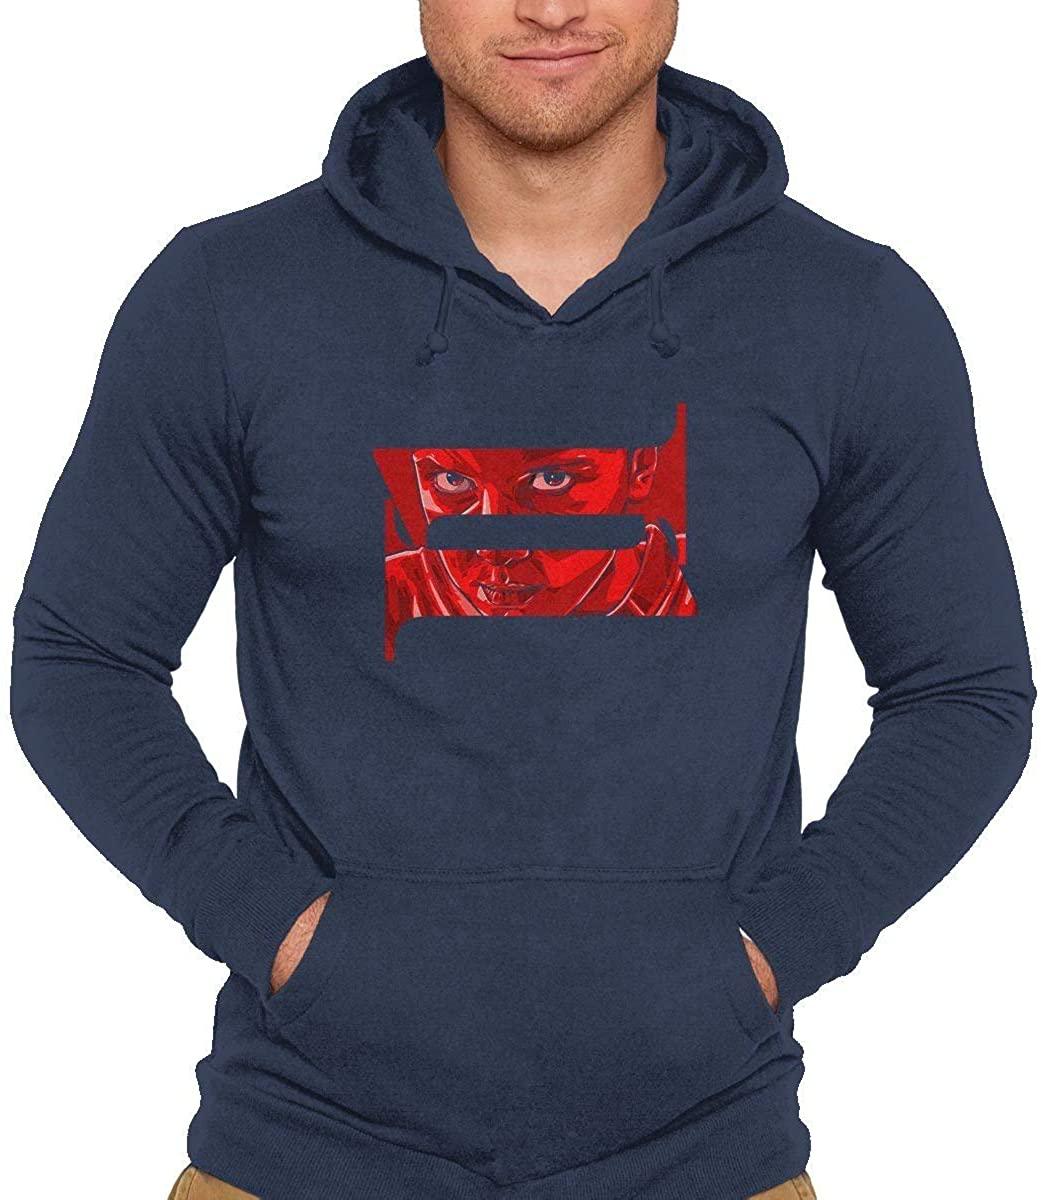 Eleven Out of Ten - Unisex Pullover Sweatshirt